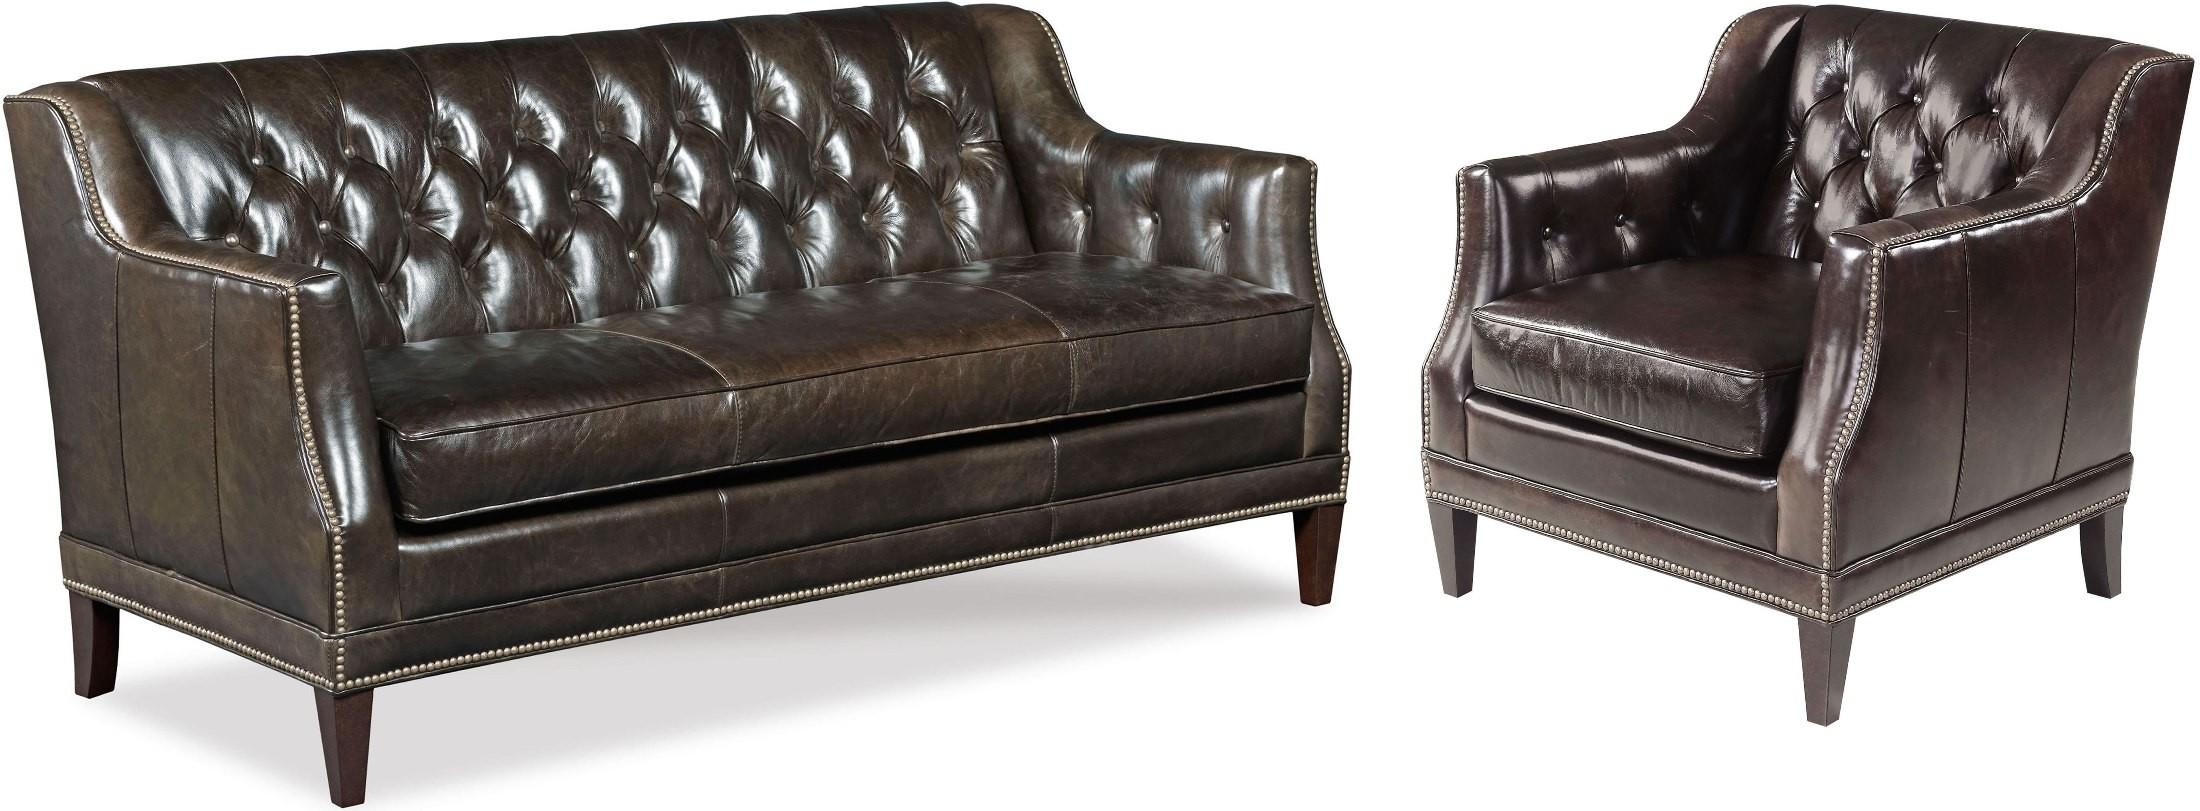 Austin Brown Leather Living Room Set From Hooker Coleman